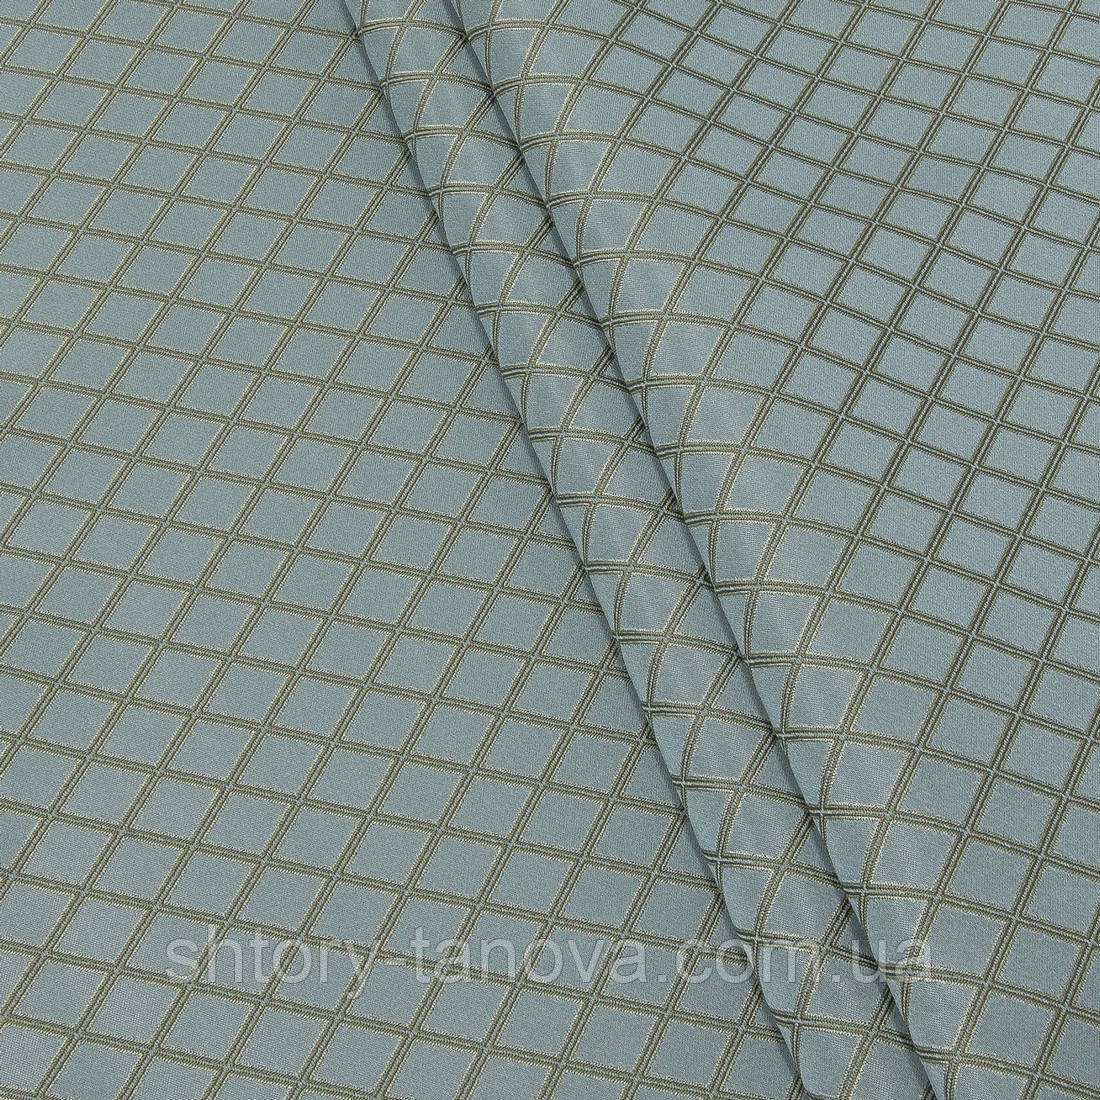 Жаккард рио-/rio ромб лазурь,беж